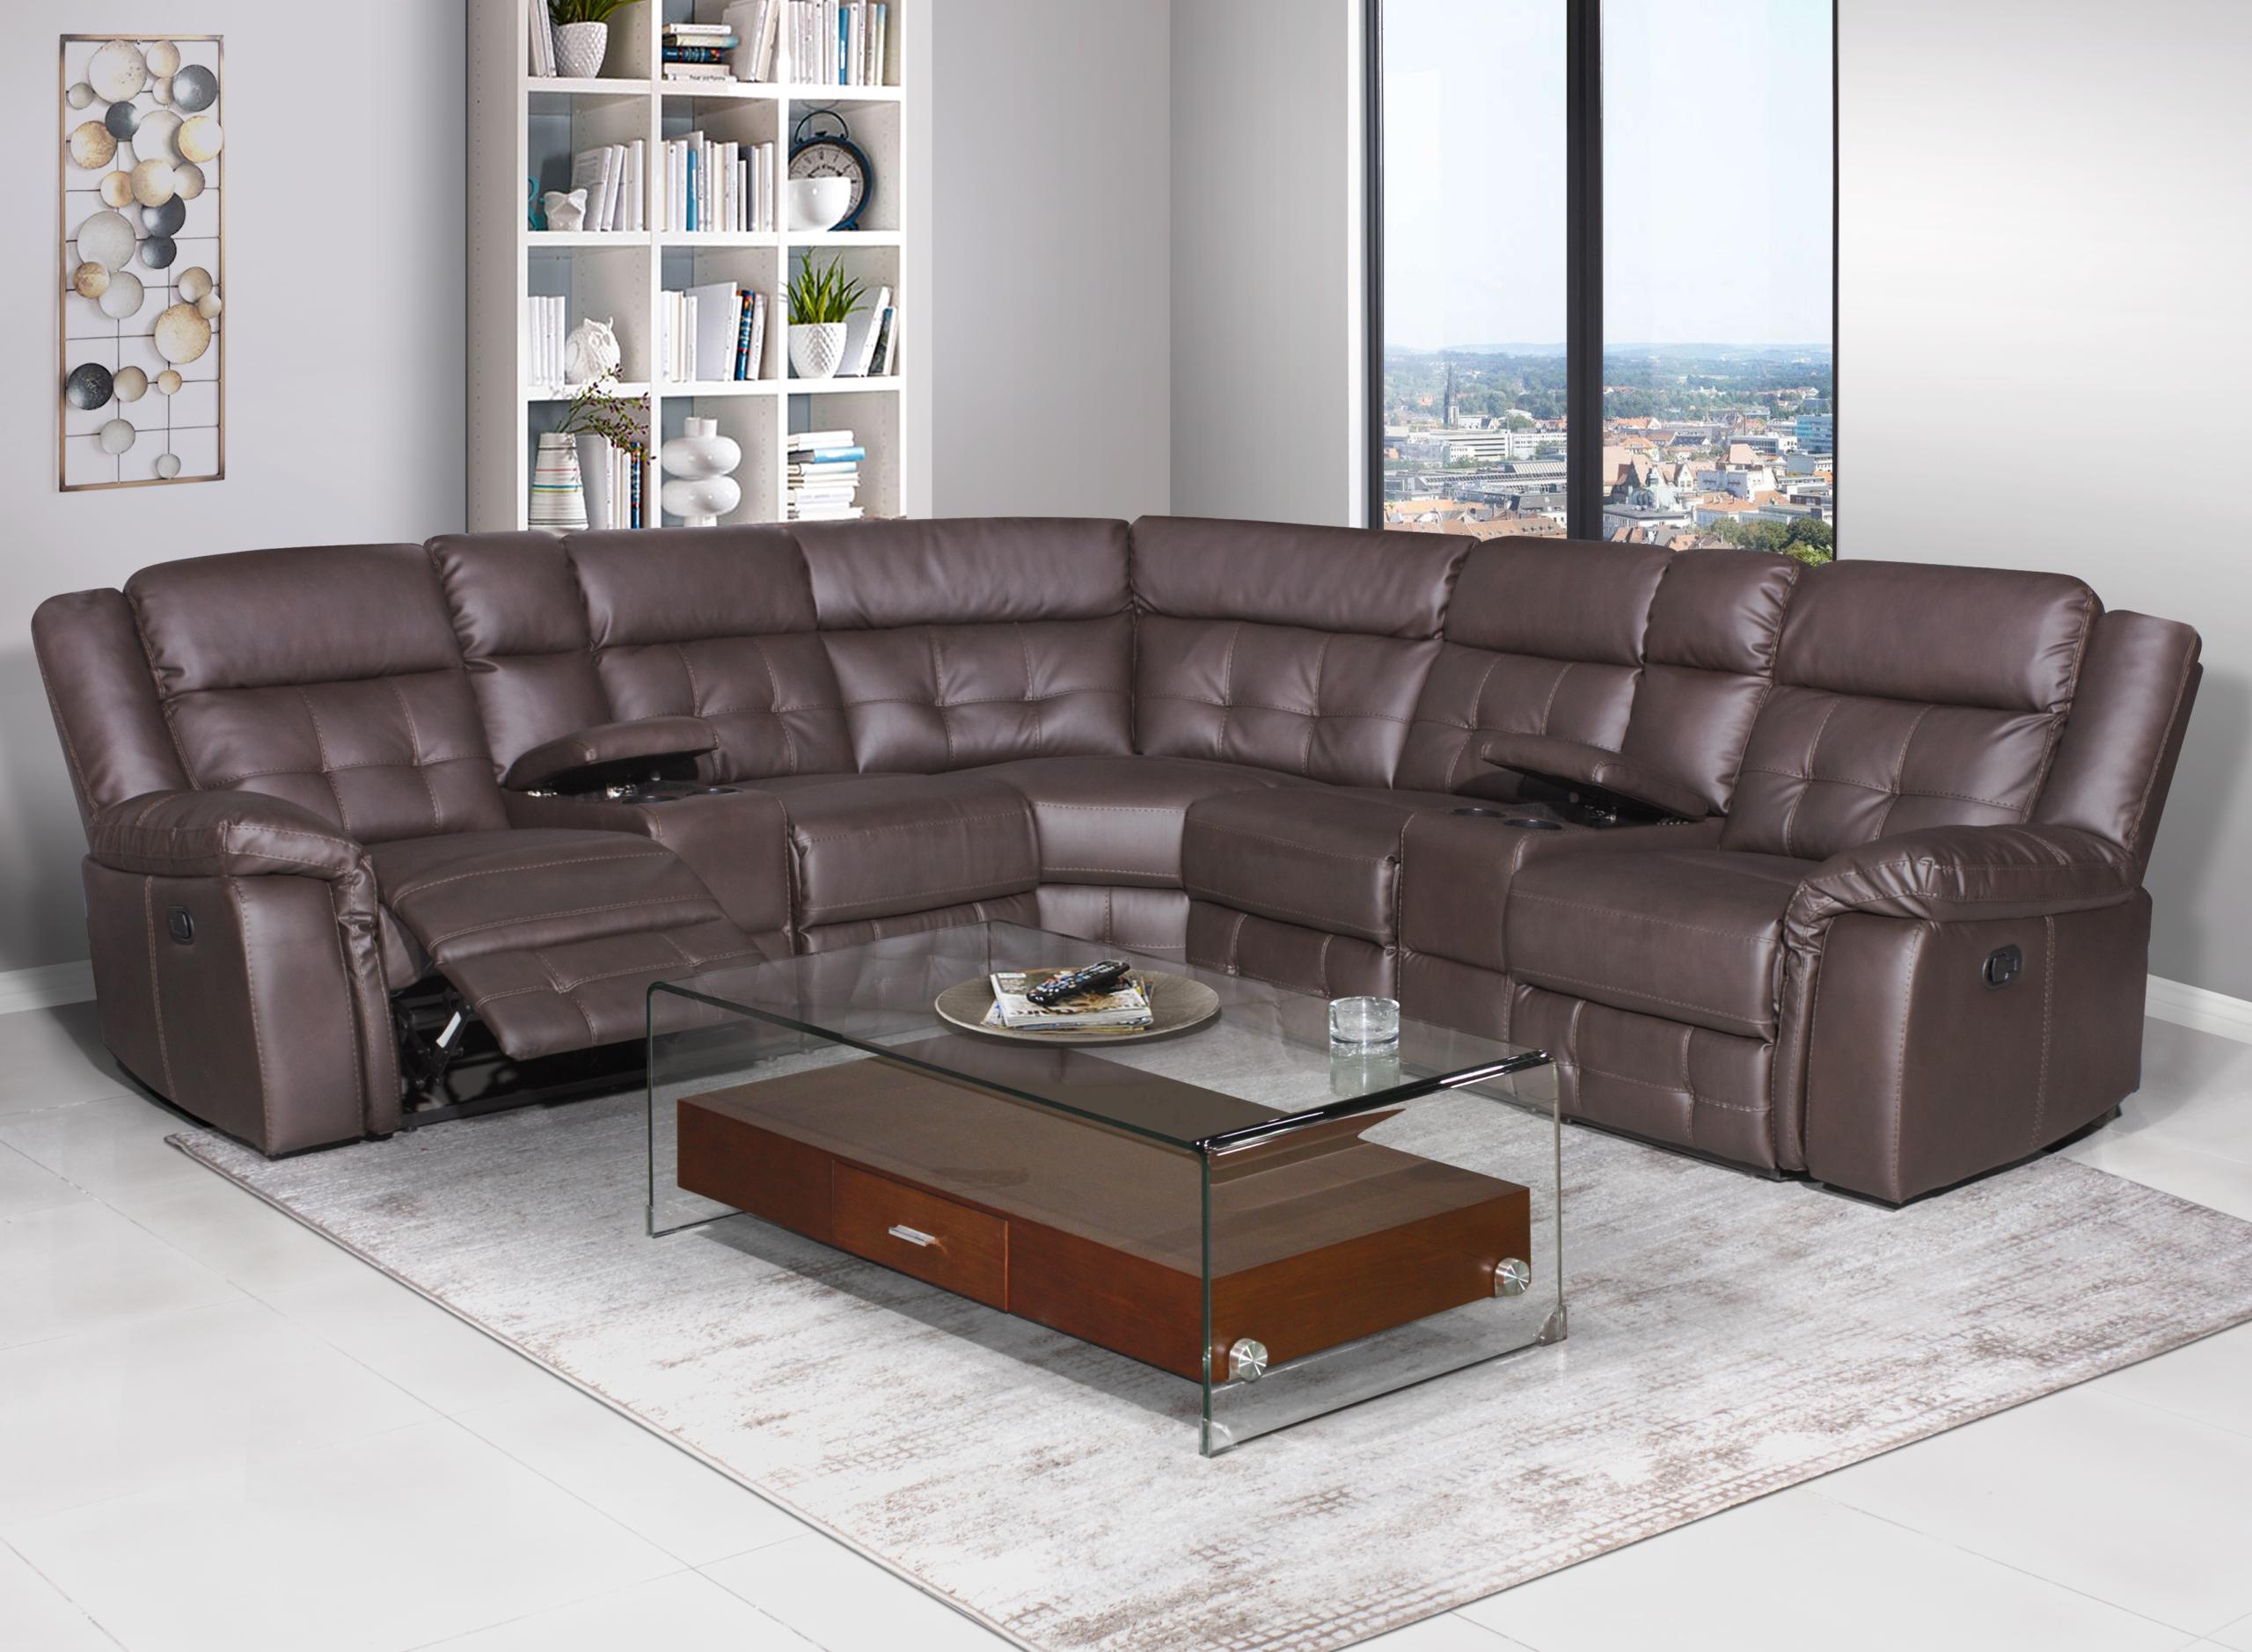 Lounge Suite 1608